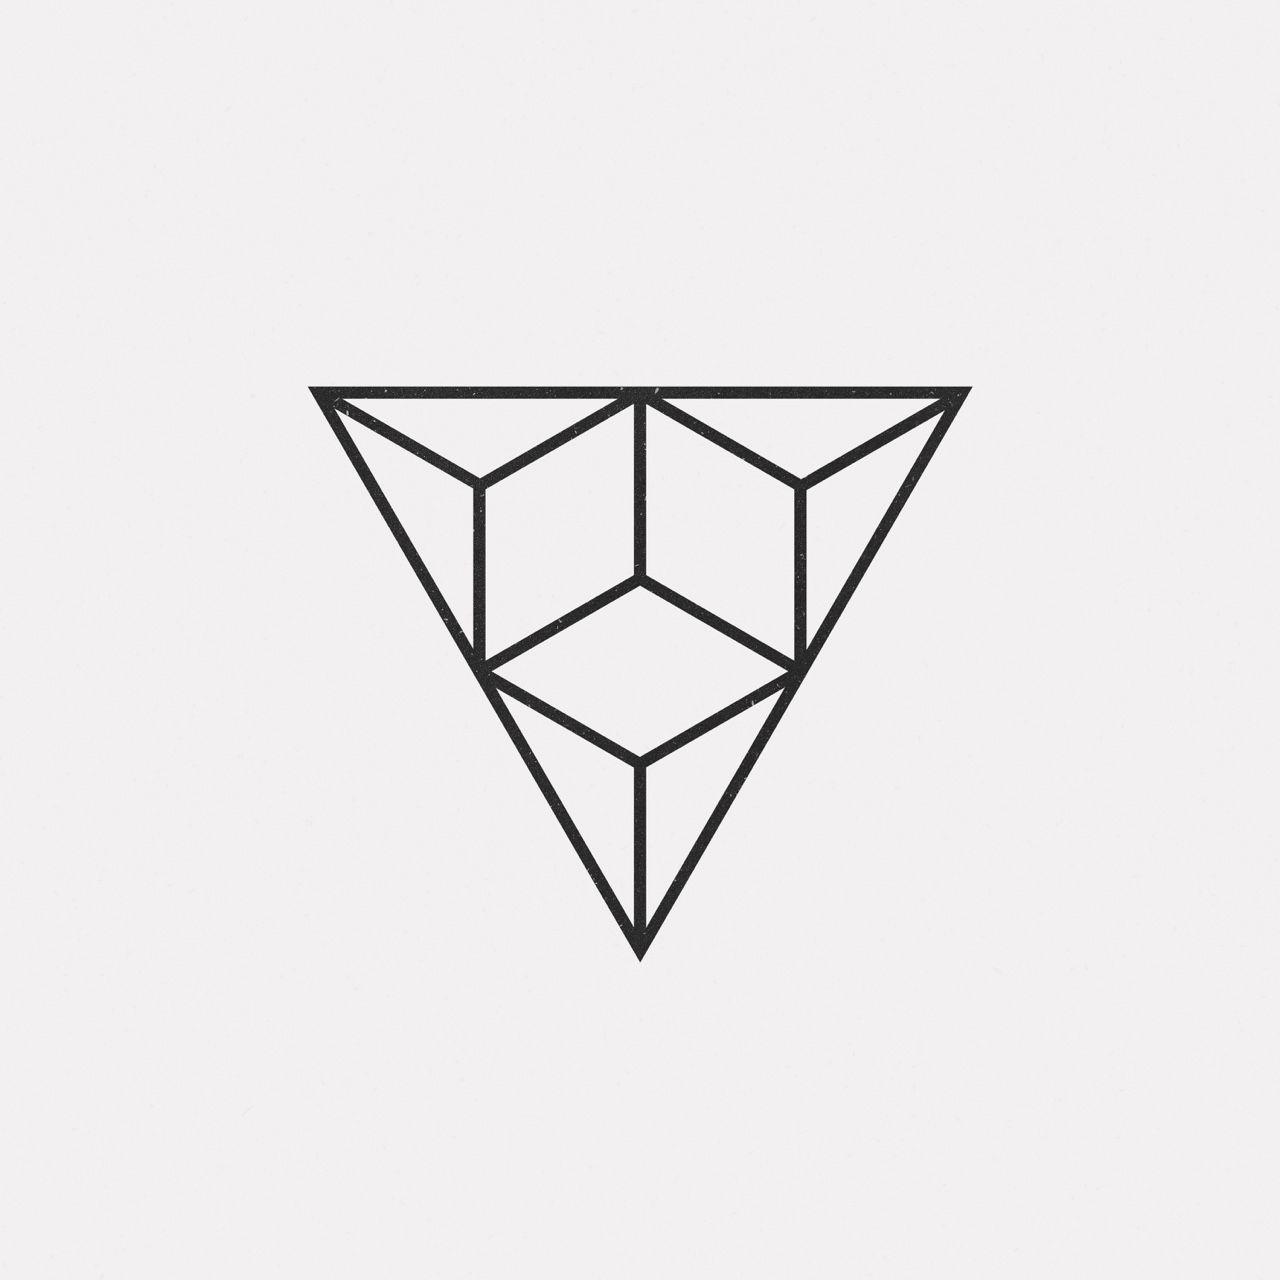 new geometric design every day triangles minimal also best designs images desenhos cranios pinturas rh br pinterest